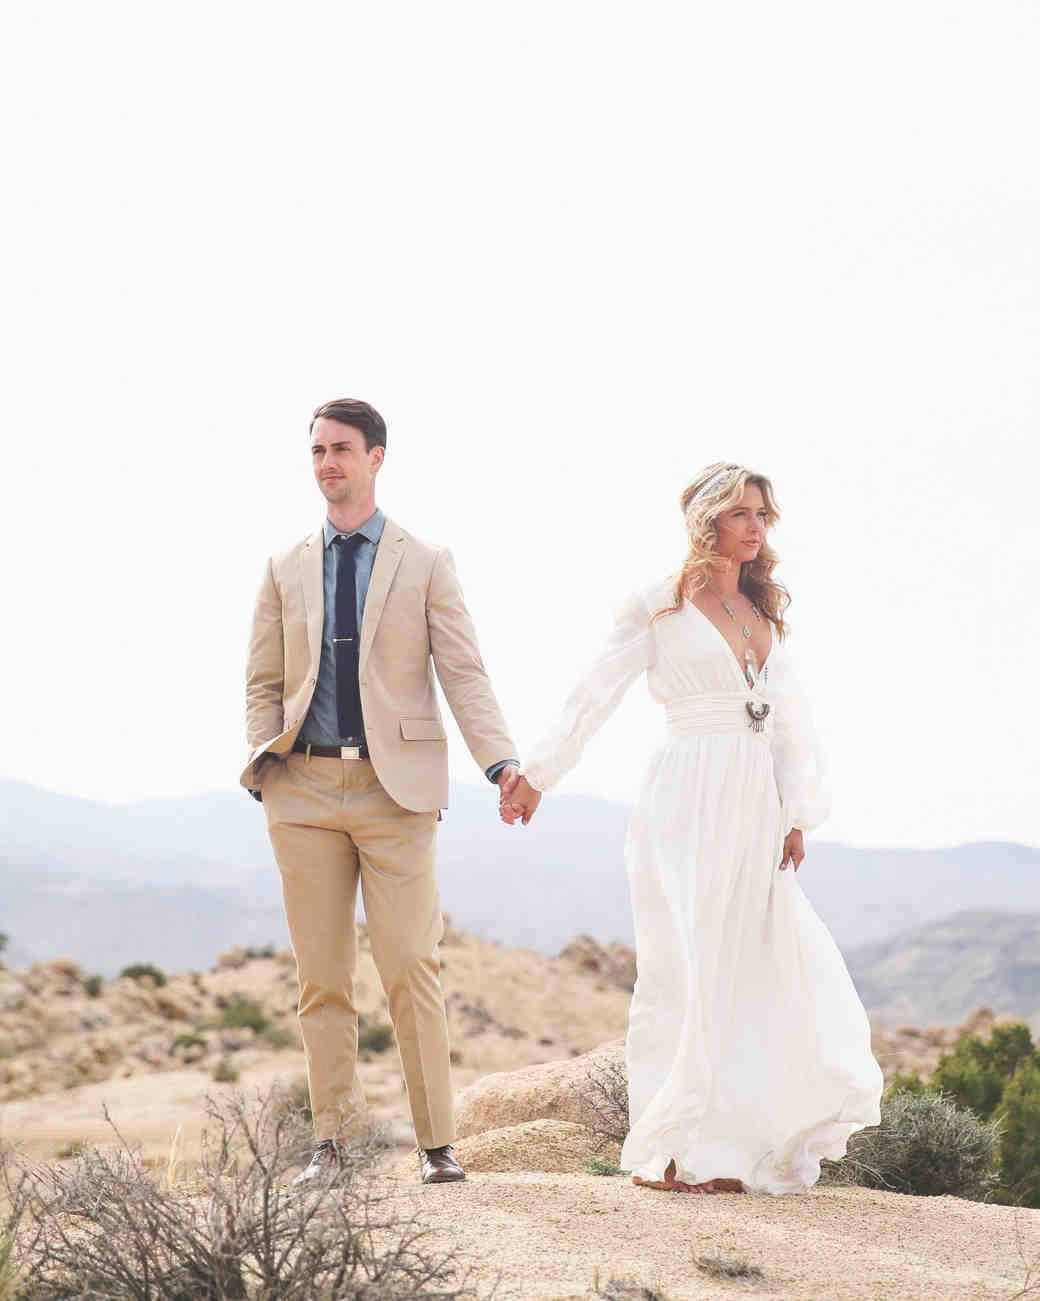 christen-billy-wedding-couple-061-011-s111597-1014.jpg